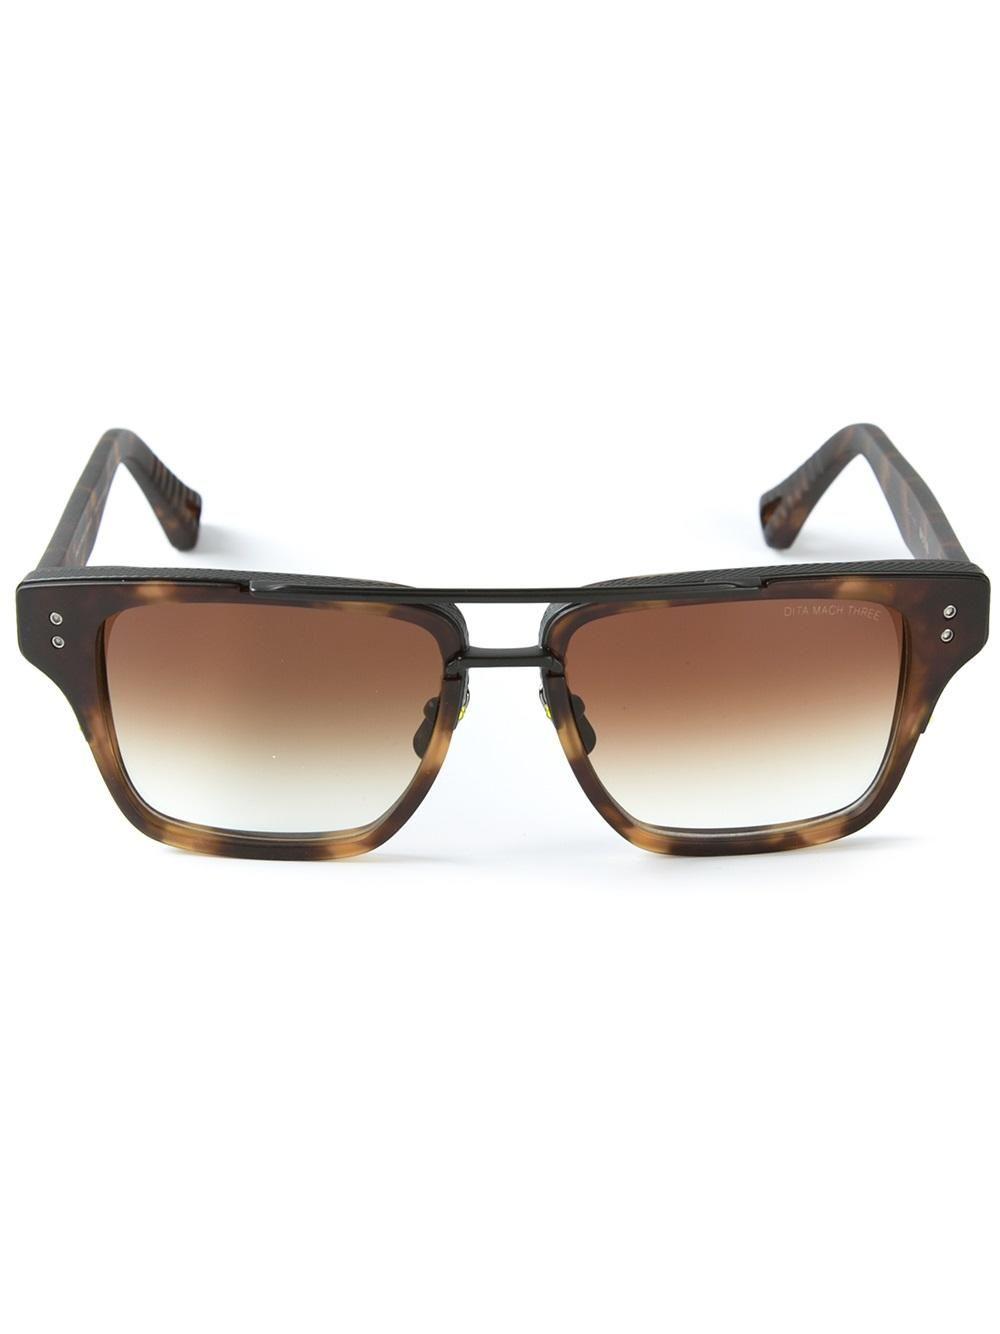 63a42a9aee Dita Eyewear Gafas De Sol Mach Three Bmatttortoise Hombre  Accesorios,sandalias Dita,Dita venezuela